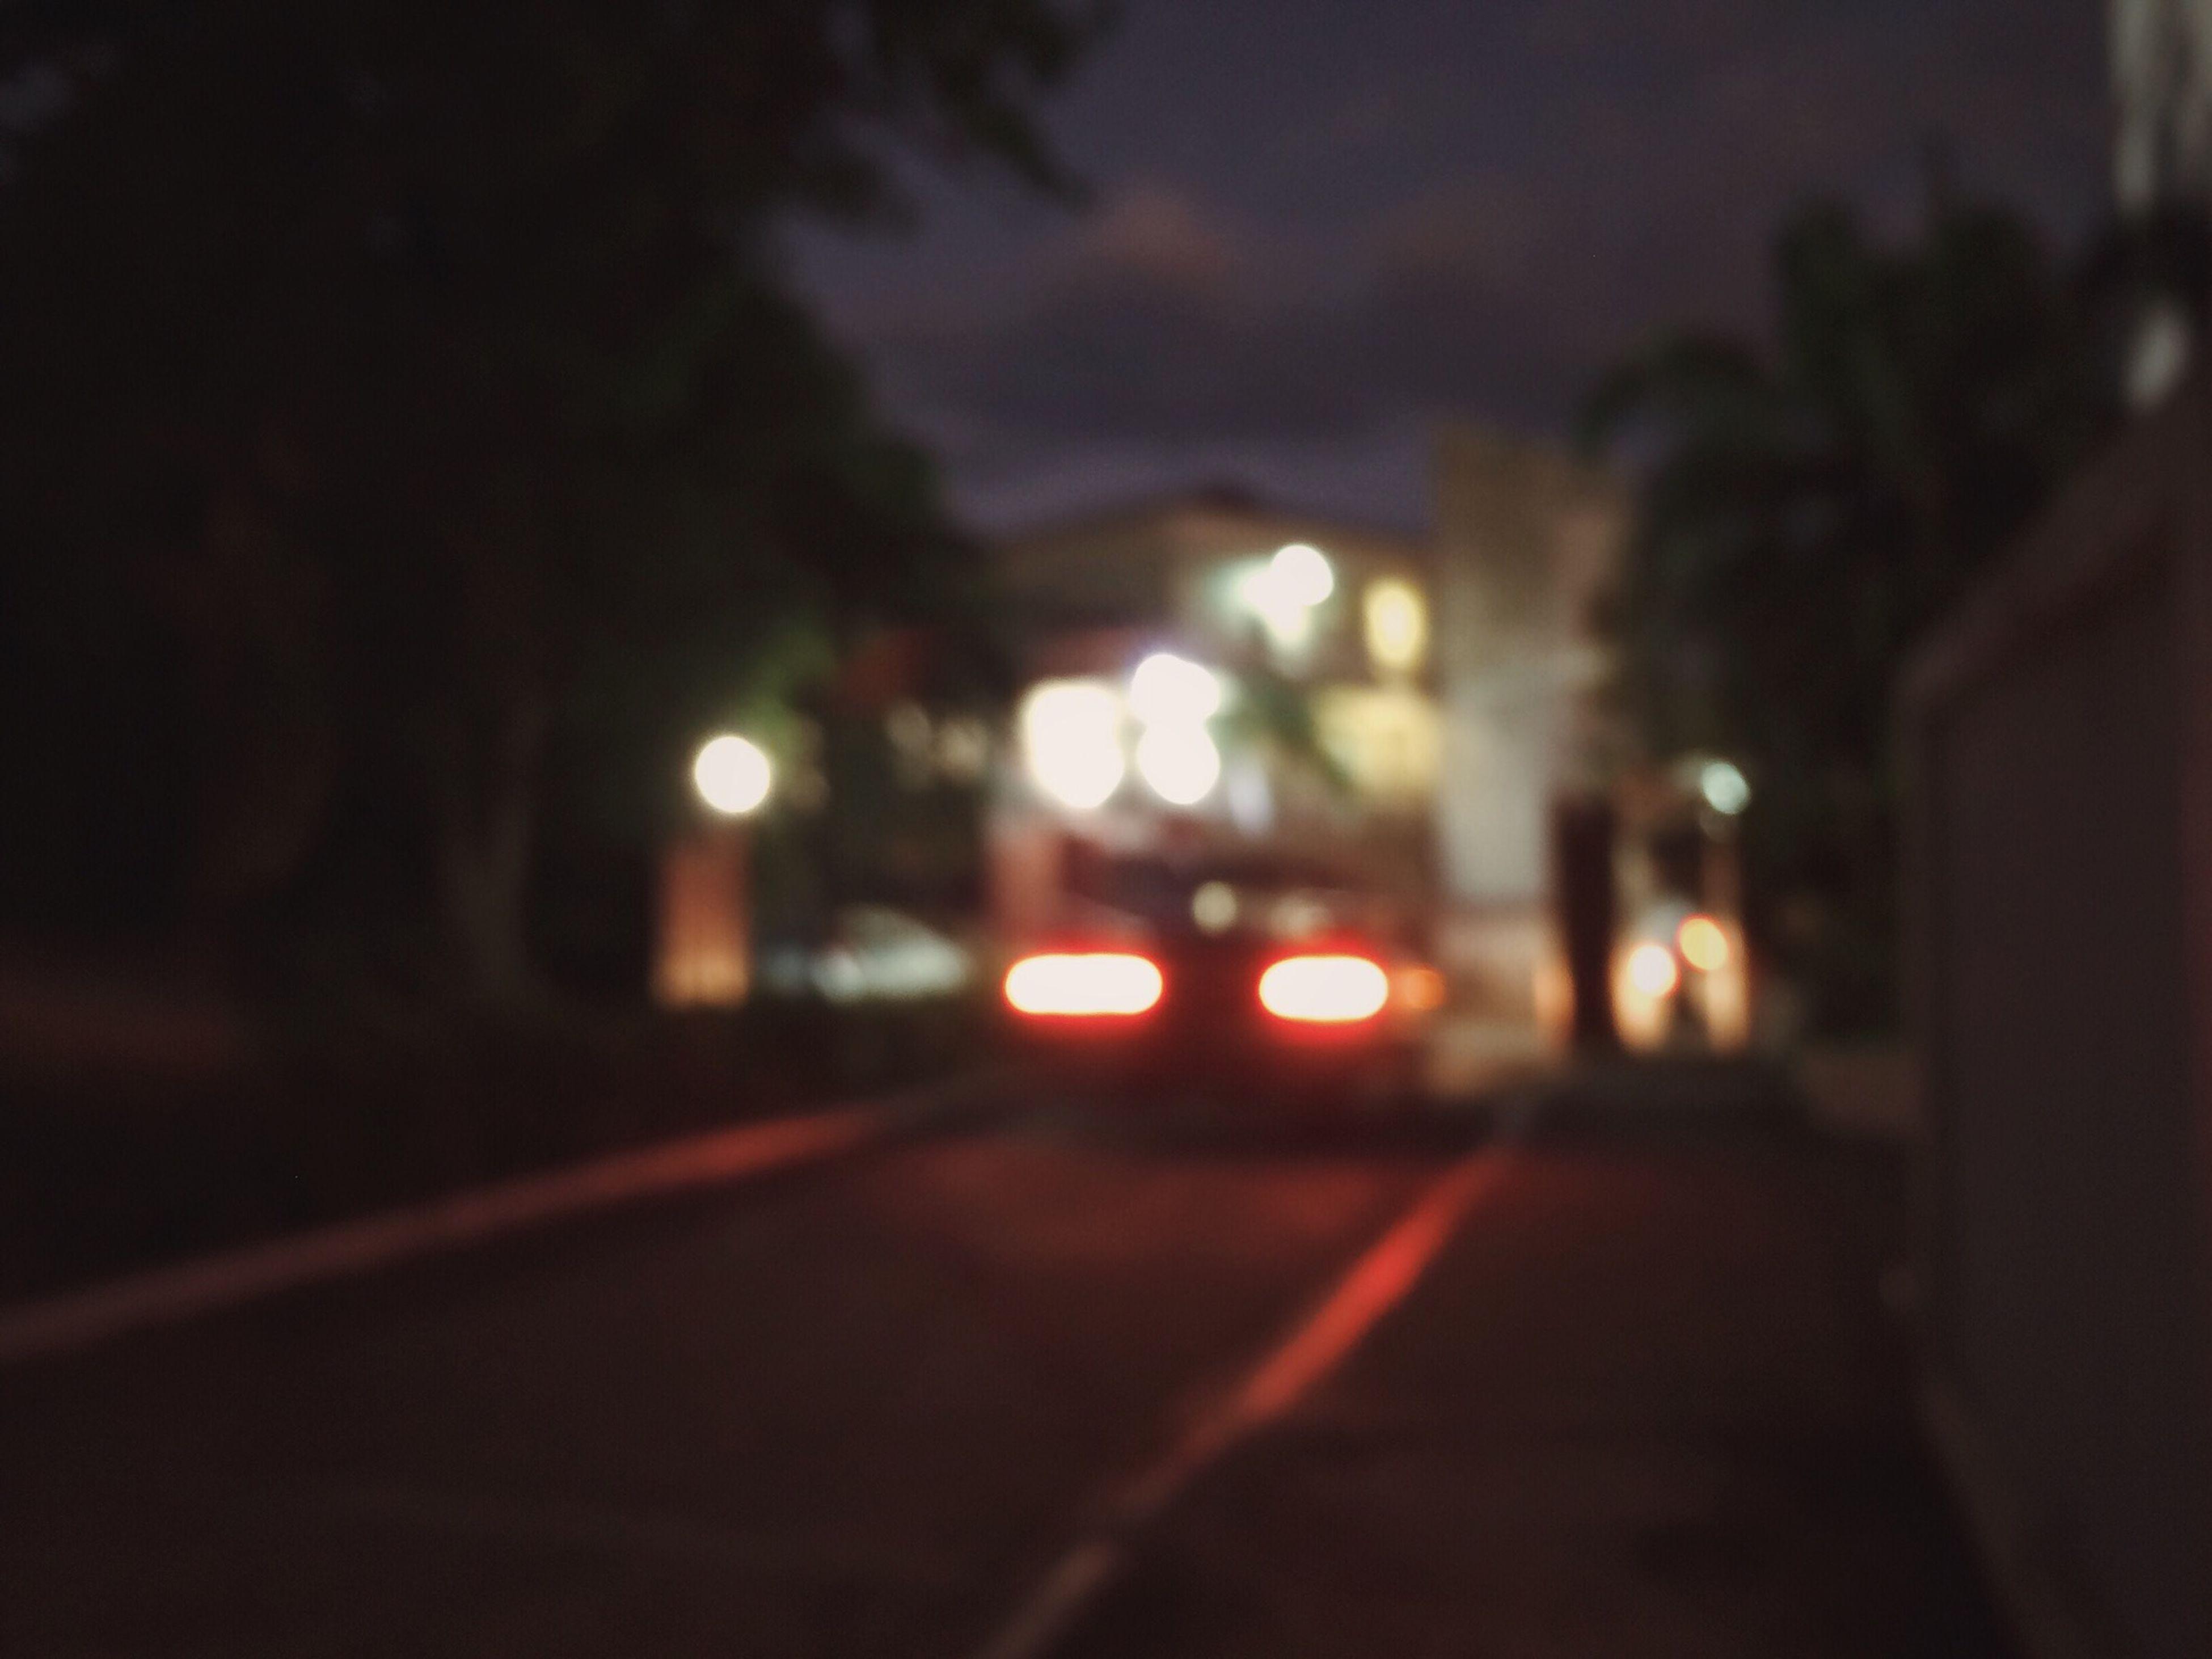 illuminated, night, transportation, street, the way forward, road, defocused, car, street light, land vehicle, city, building exterior, lighting equipment, dark, mode of transport, architecture, built structure, surface level, road marking, city street